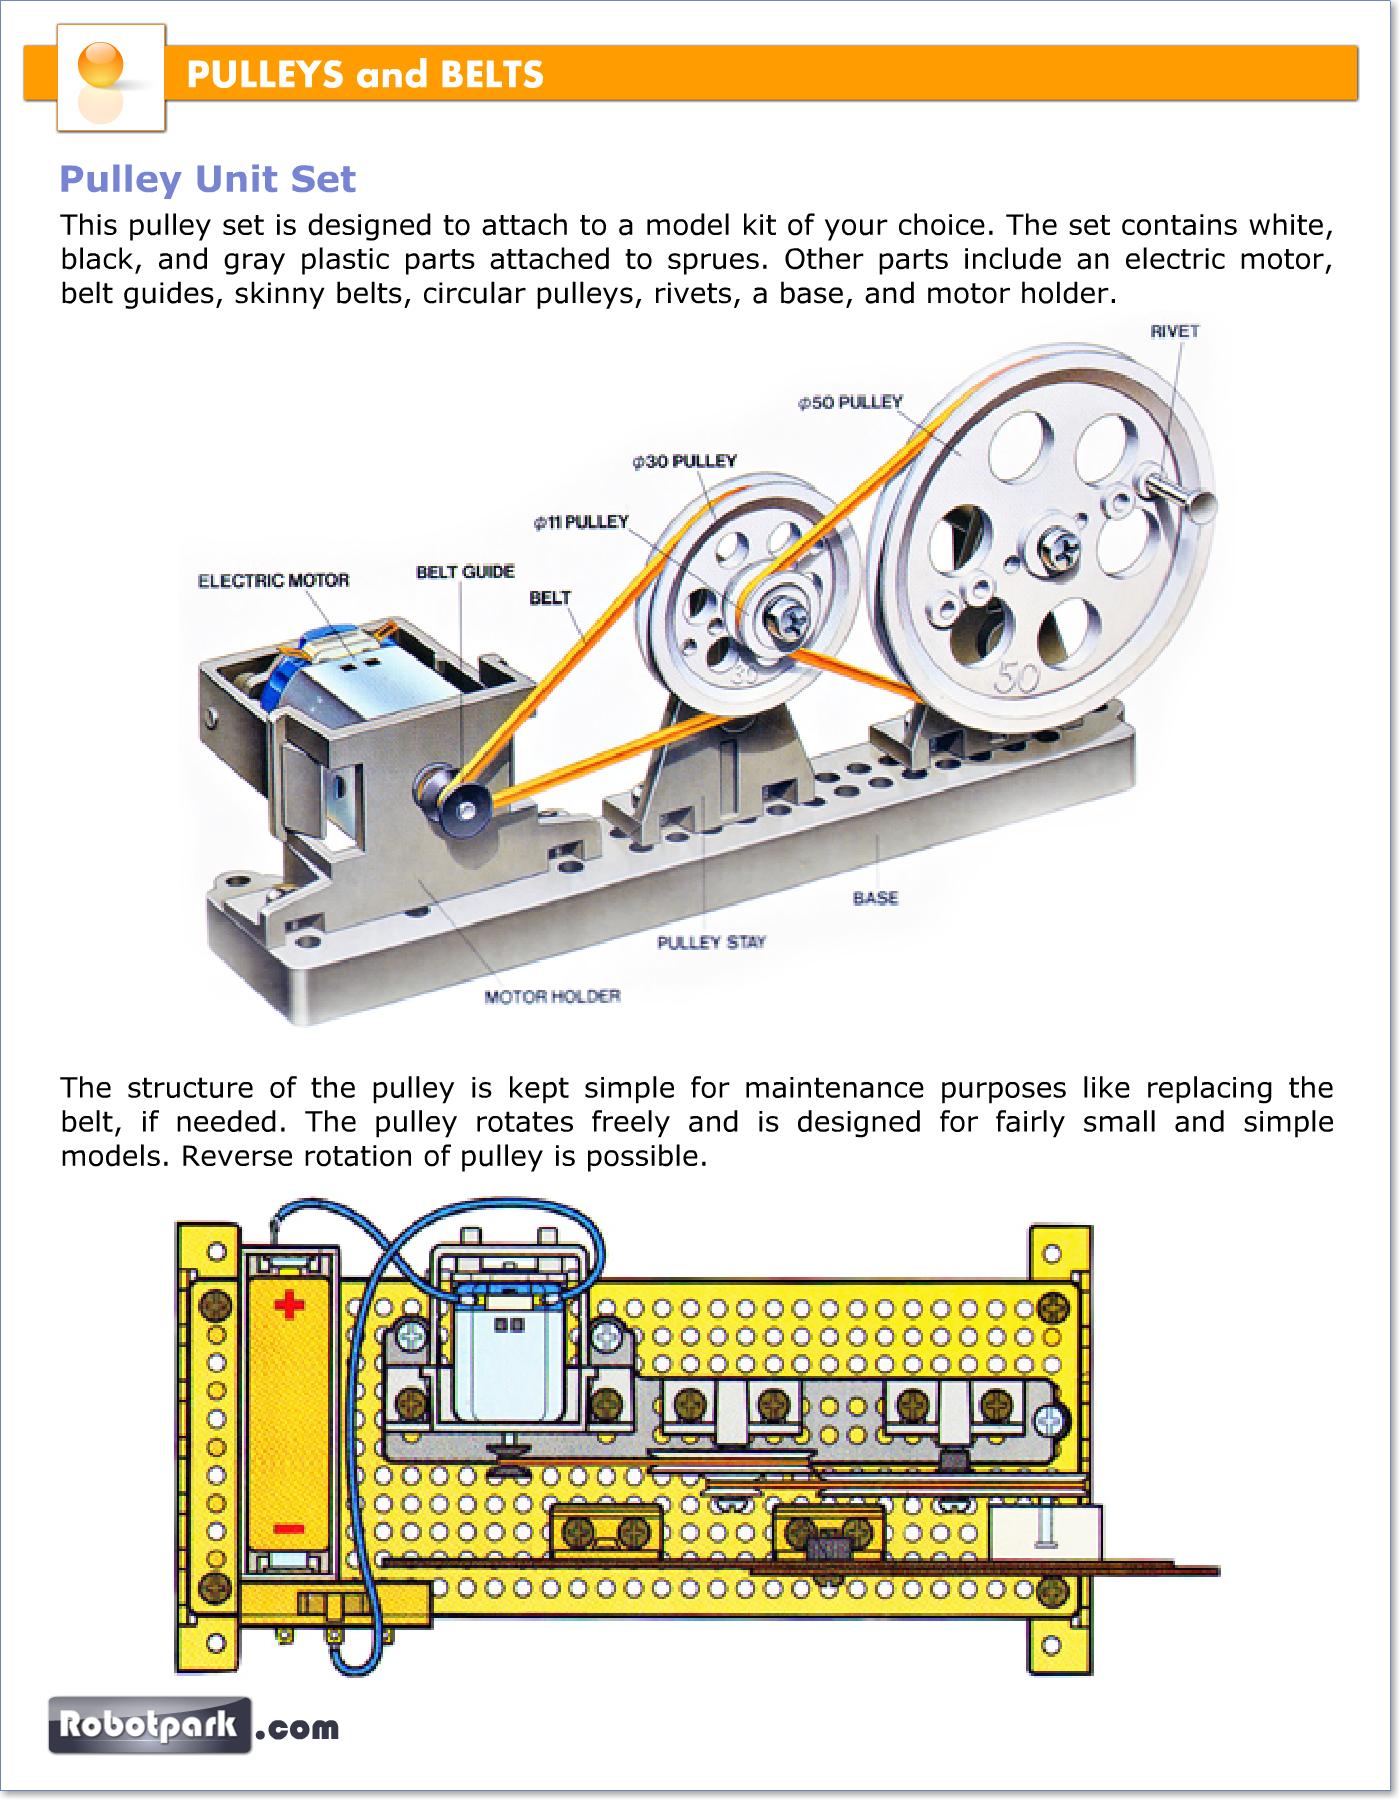 Robotic Mechanisms Pulleys And Belts 51045 Robotpark